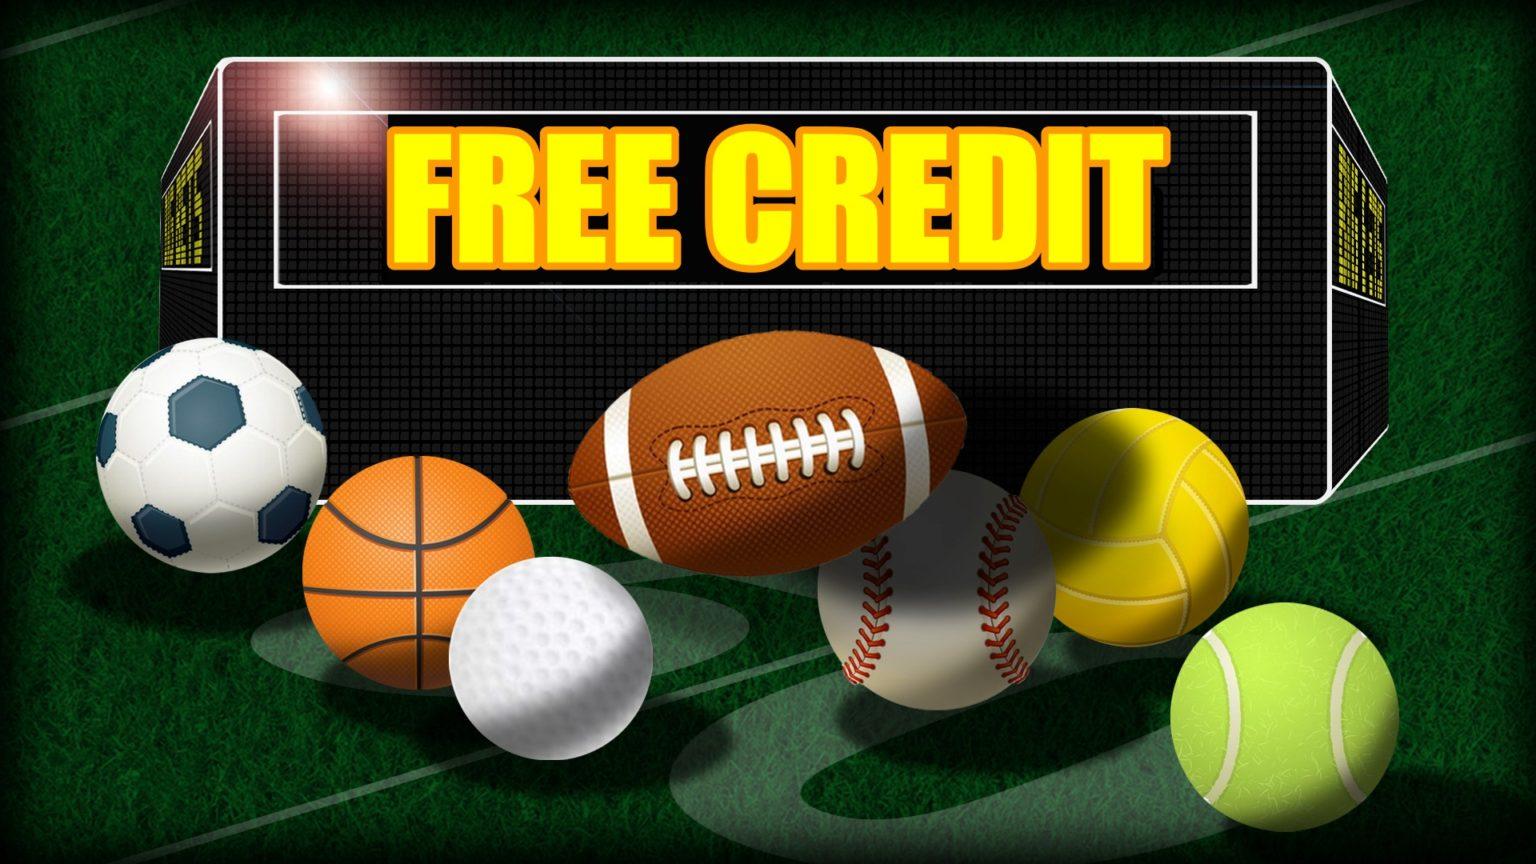 Free sports bet no deposit 2021 sports betting reddit ama channing